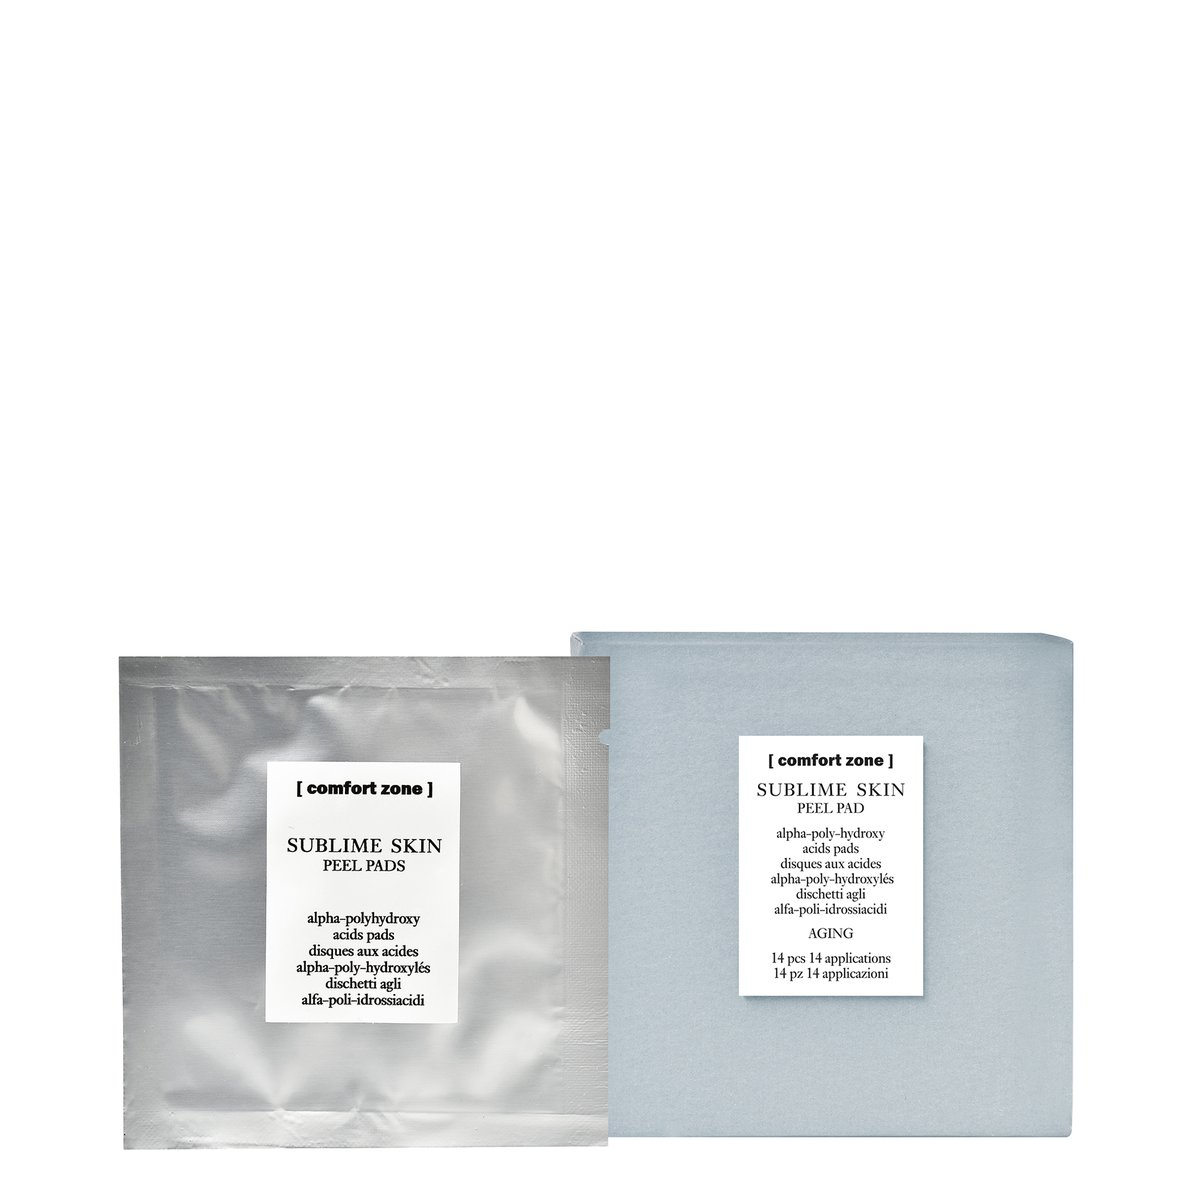 SUBLIME SKIN PEEL PAD - Alpha-Polyhydroxysäuren-Pads